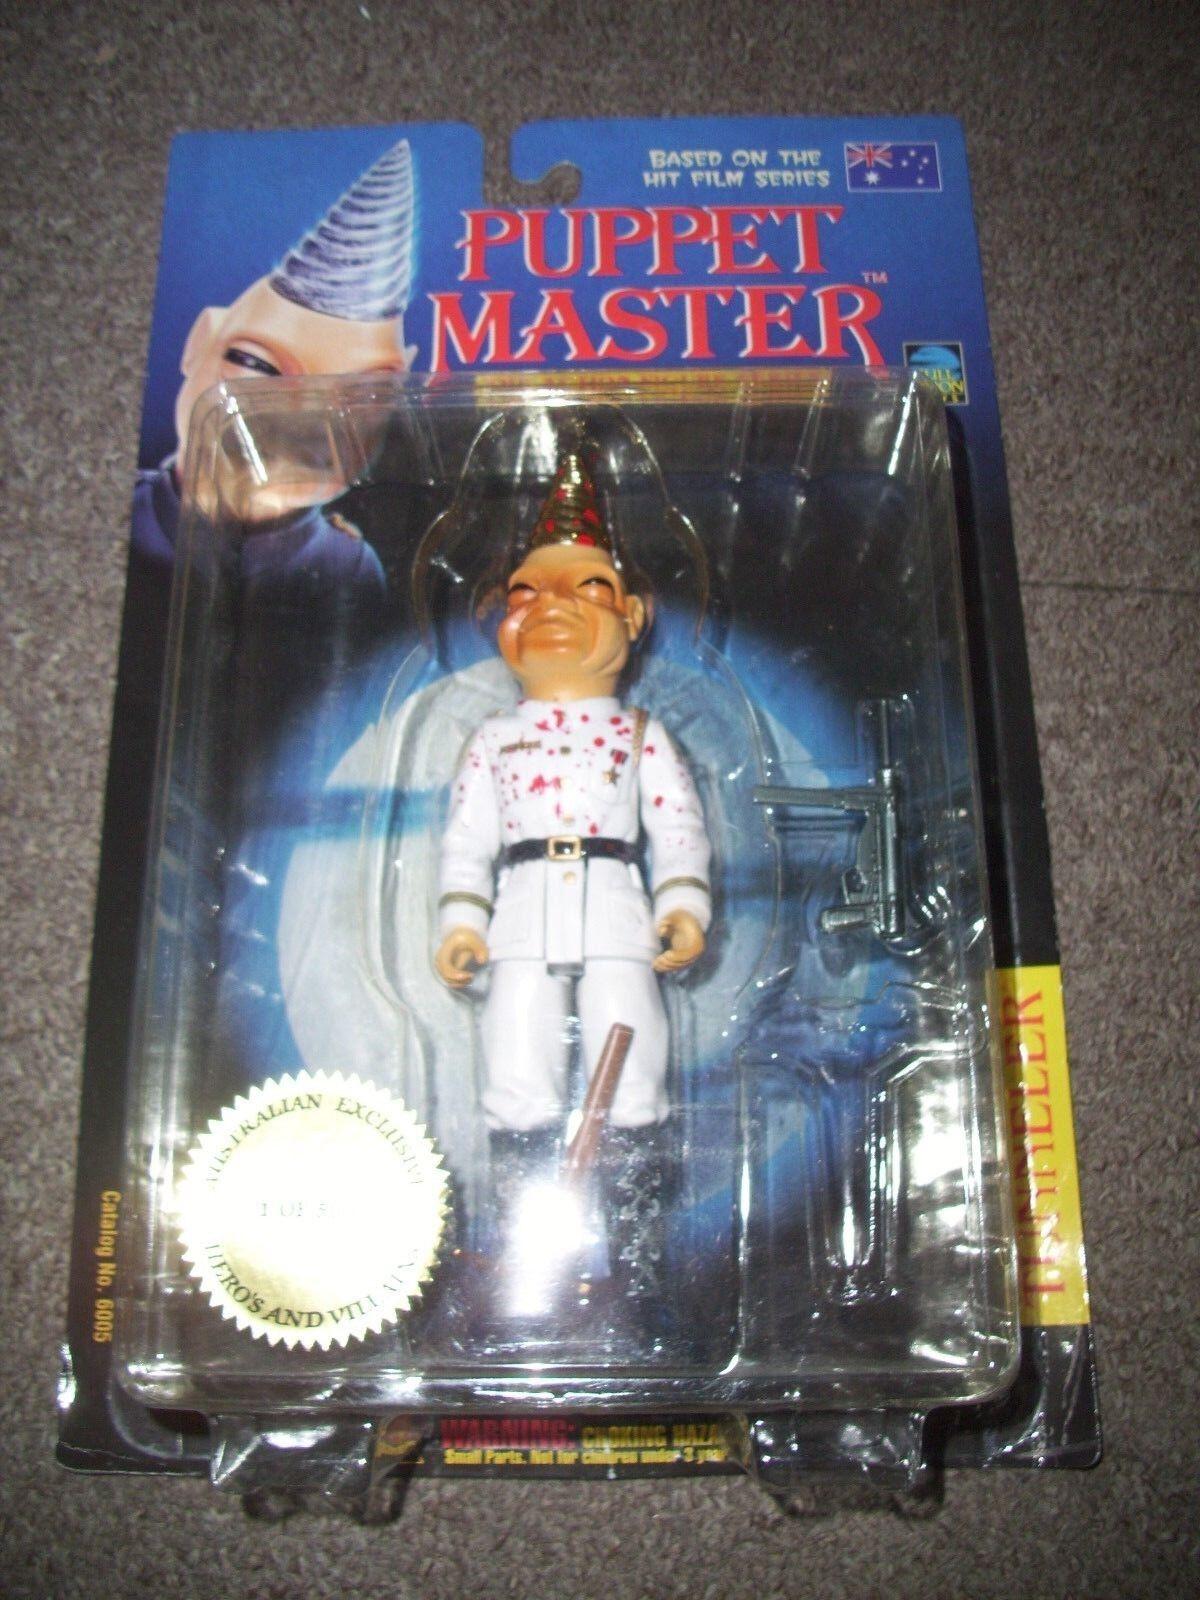 marca Puppet Puppet Puppet Master-Tunneler-Figura. australiano Exclusivo. Sellada  Envío 100% gratuito